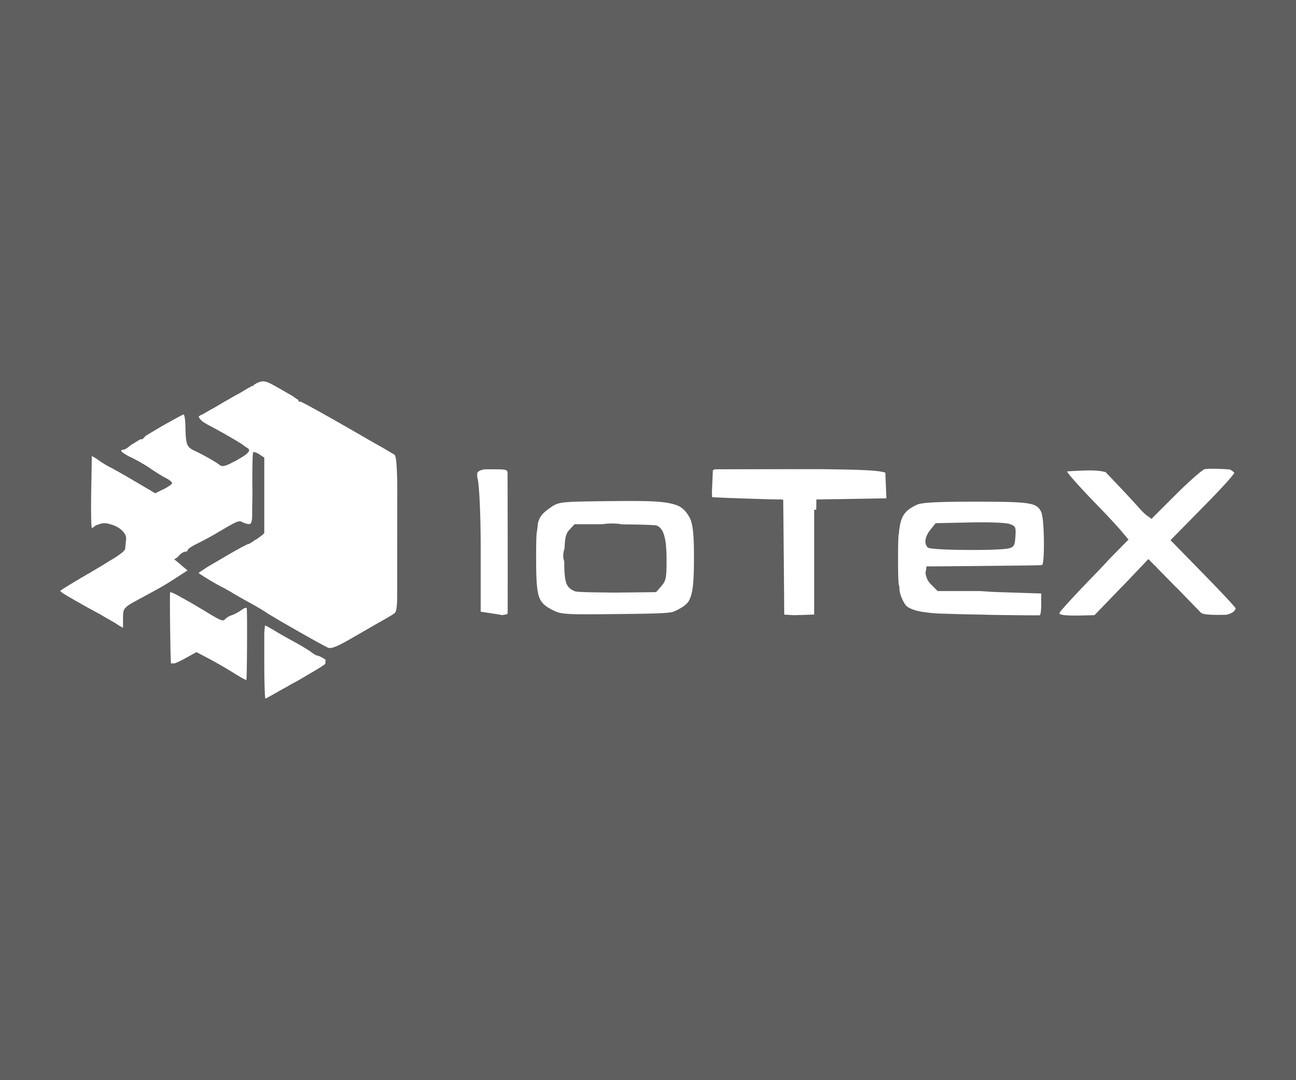 iotex.jpg